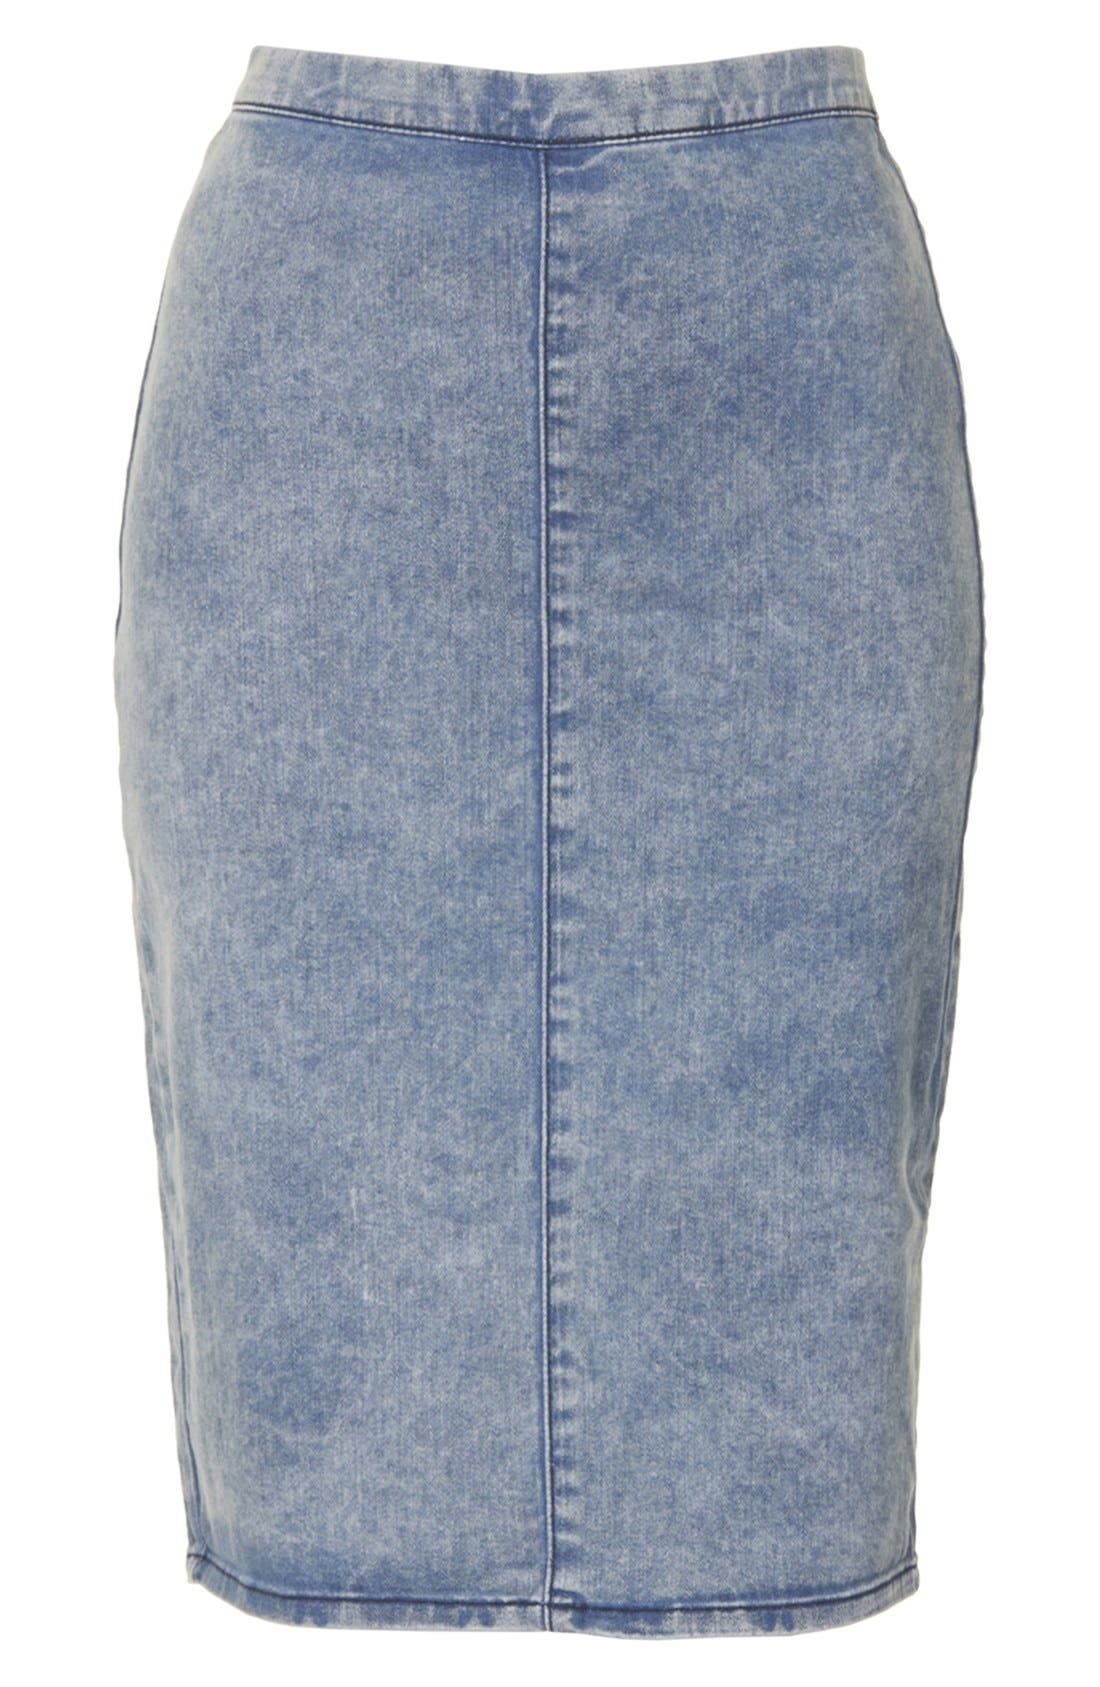 Alternate Image 3  - Topshop Moto Acid Wash Denim Pencil Skirt